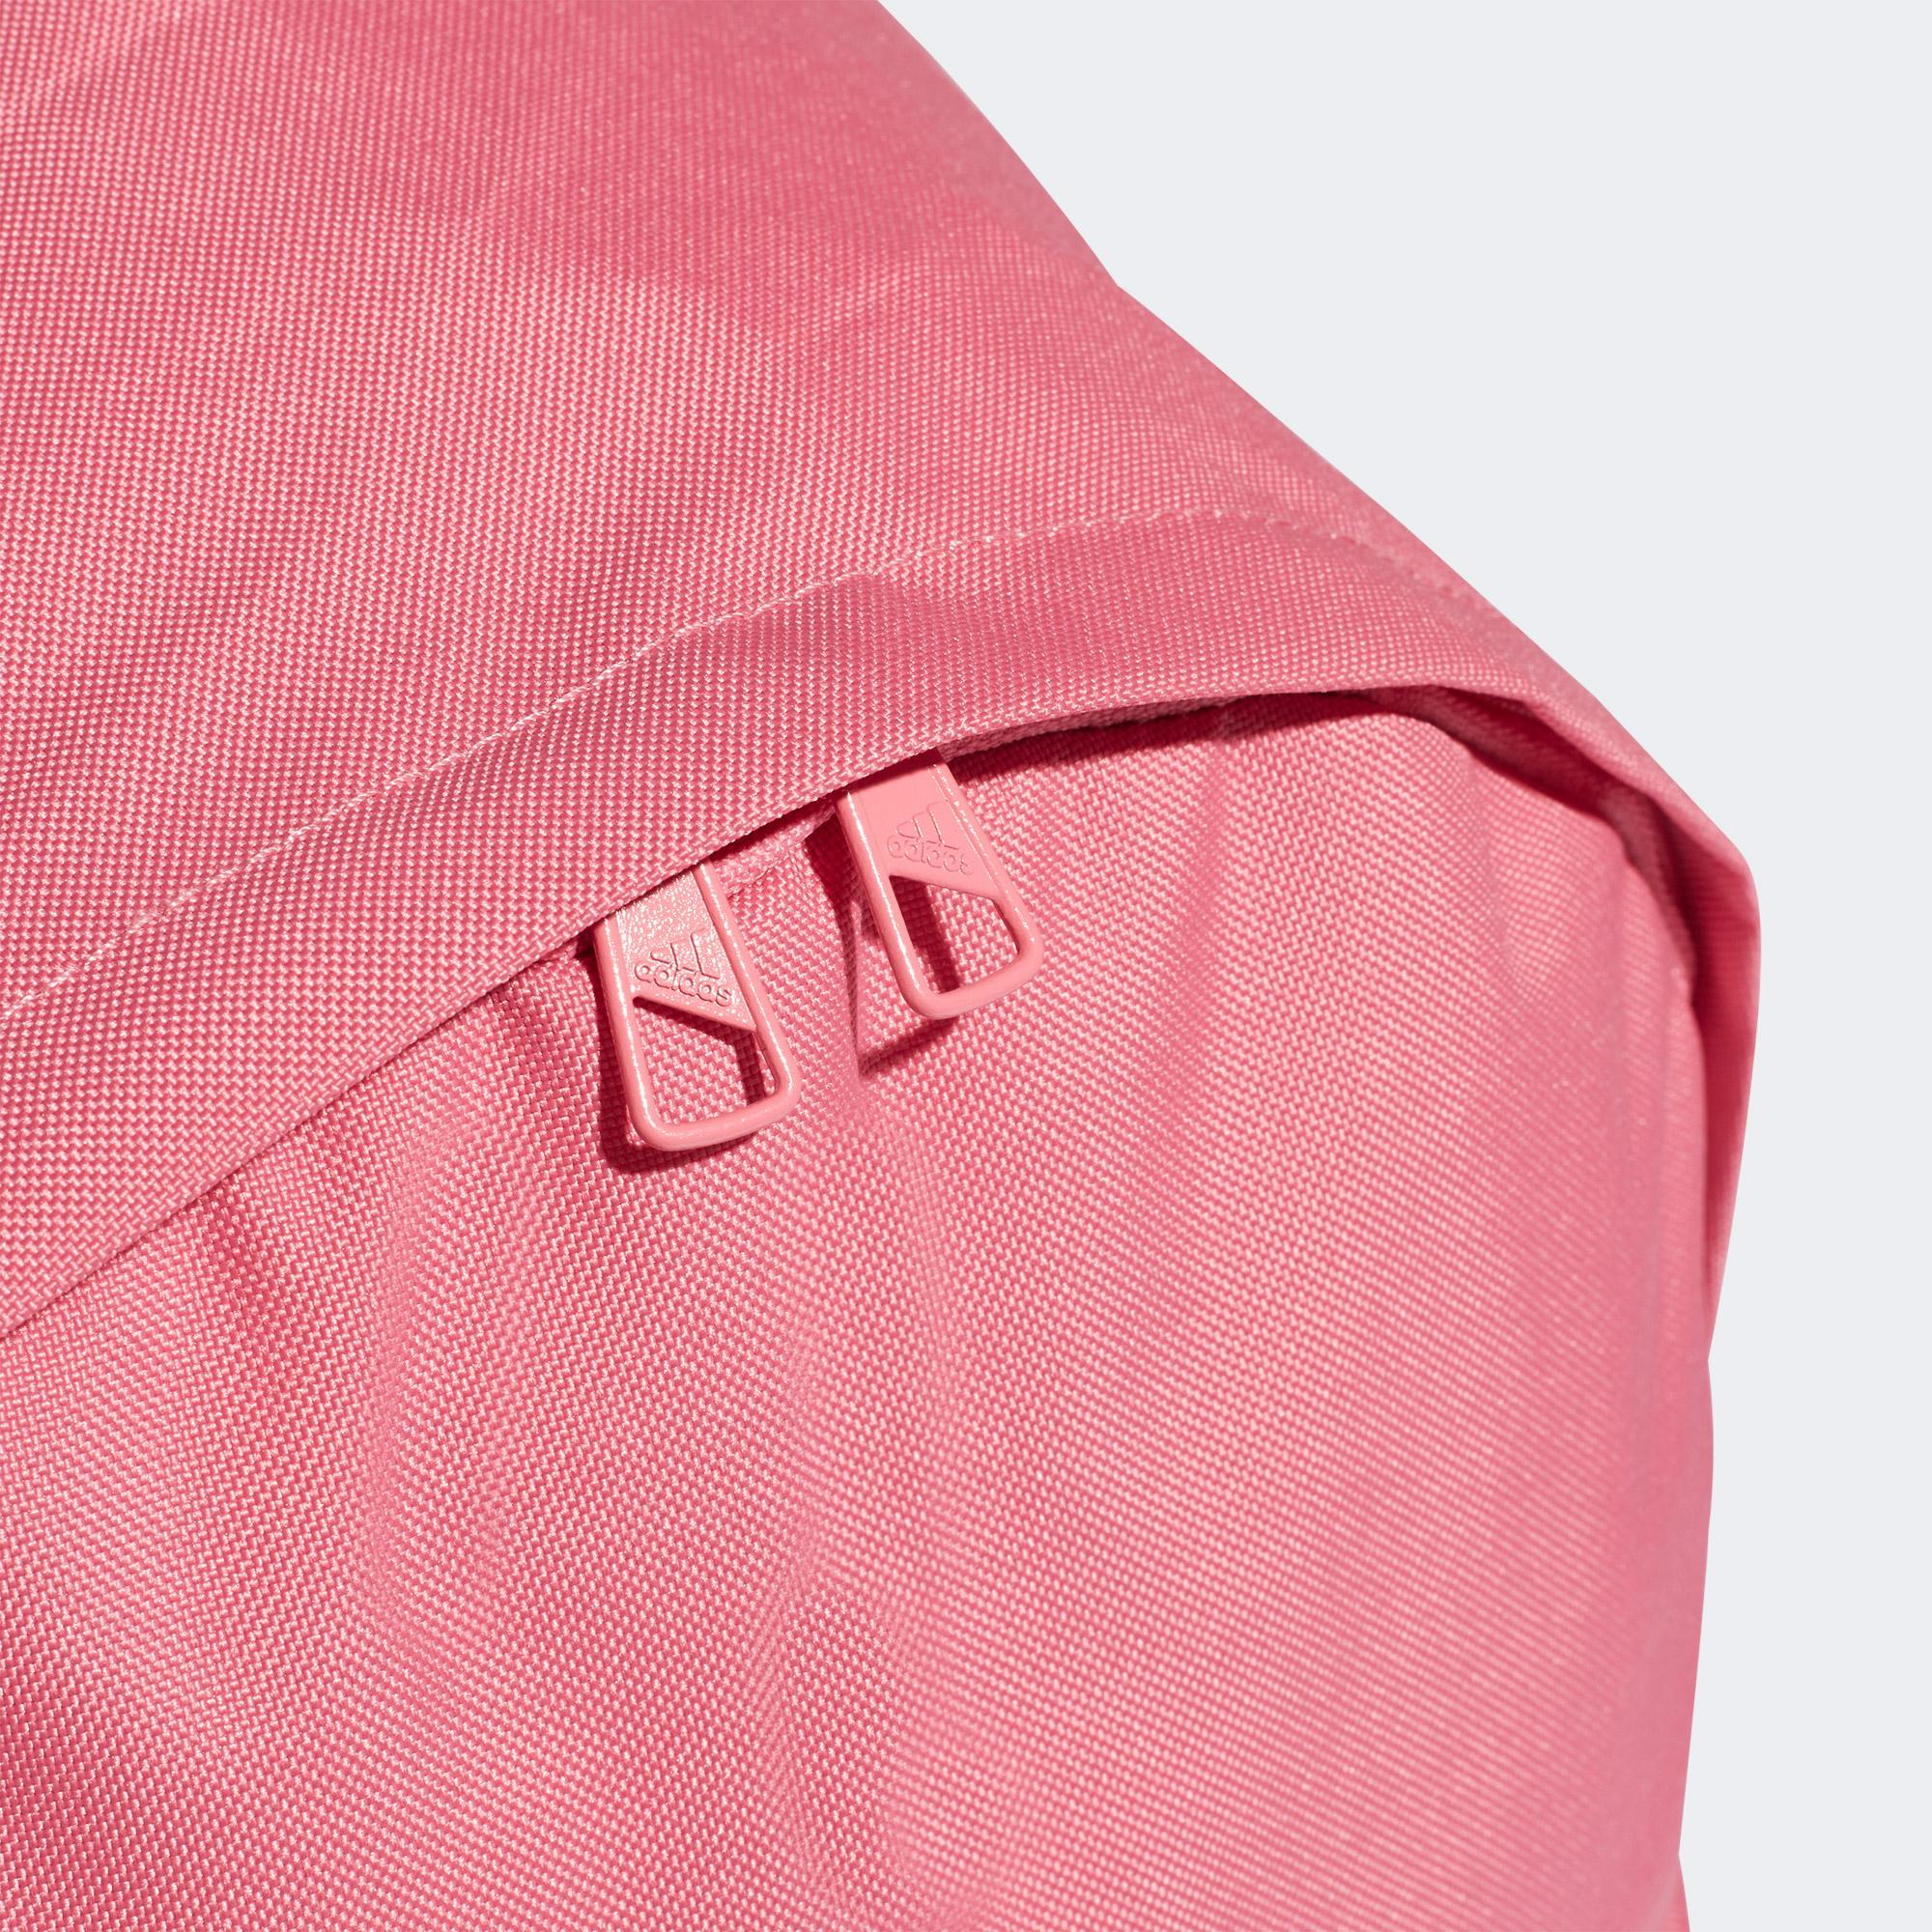 adidas Classic Badge of Sport Unisex Pembe Sırt Çantası